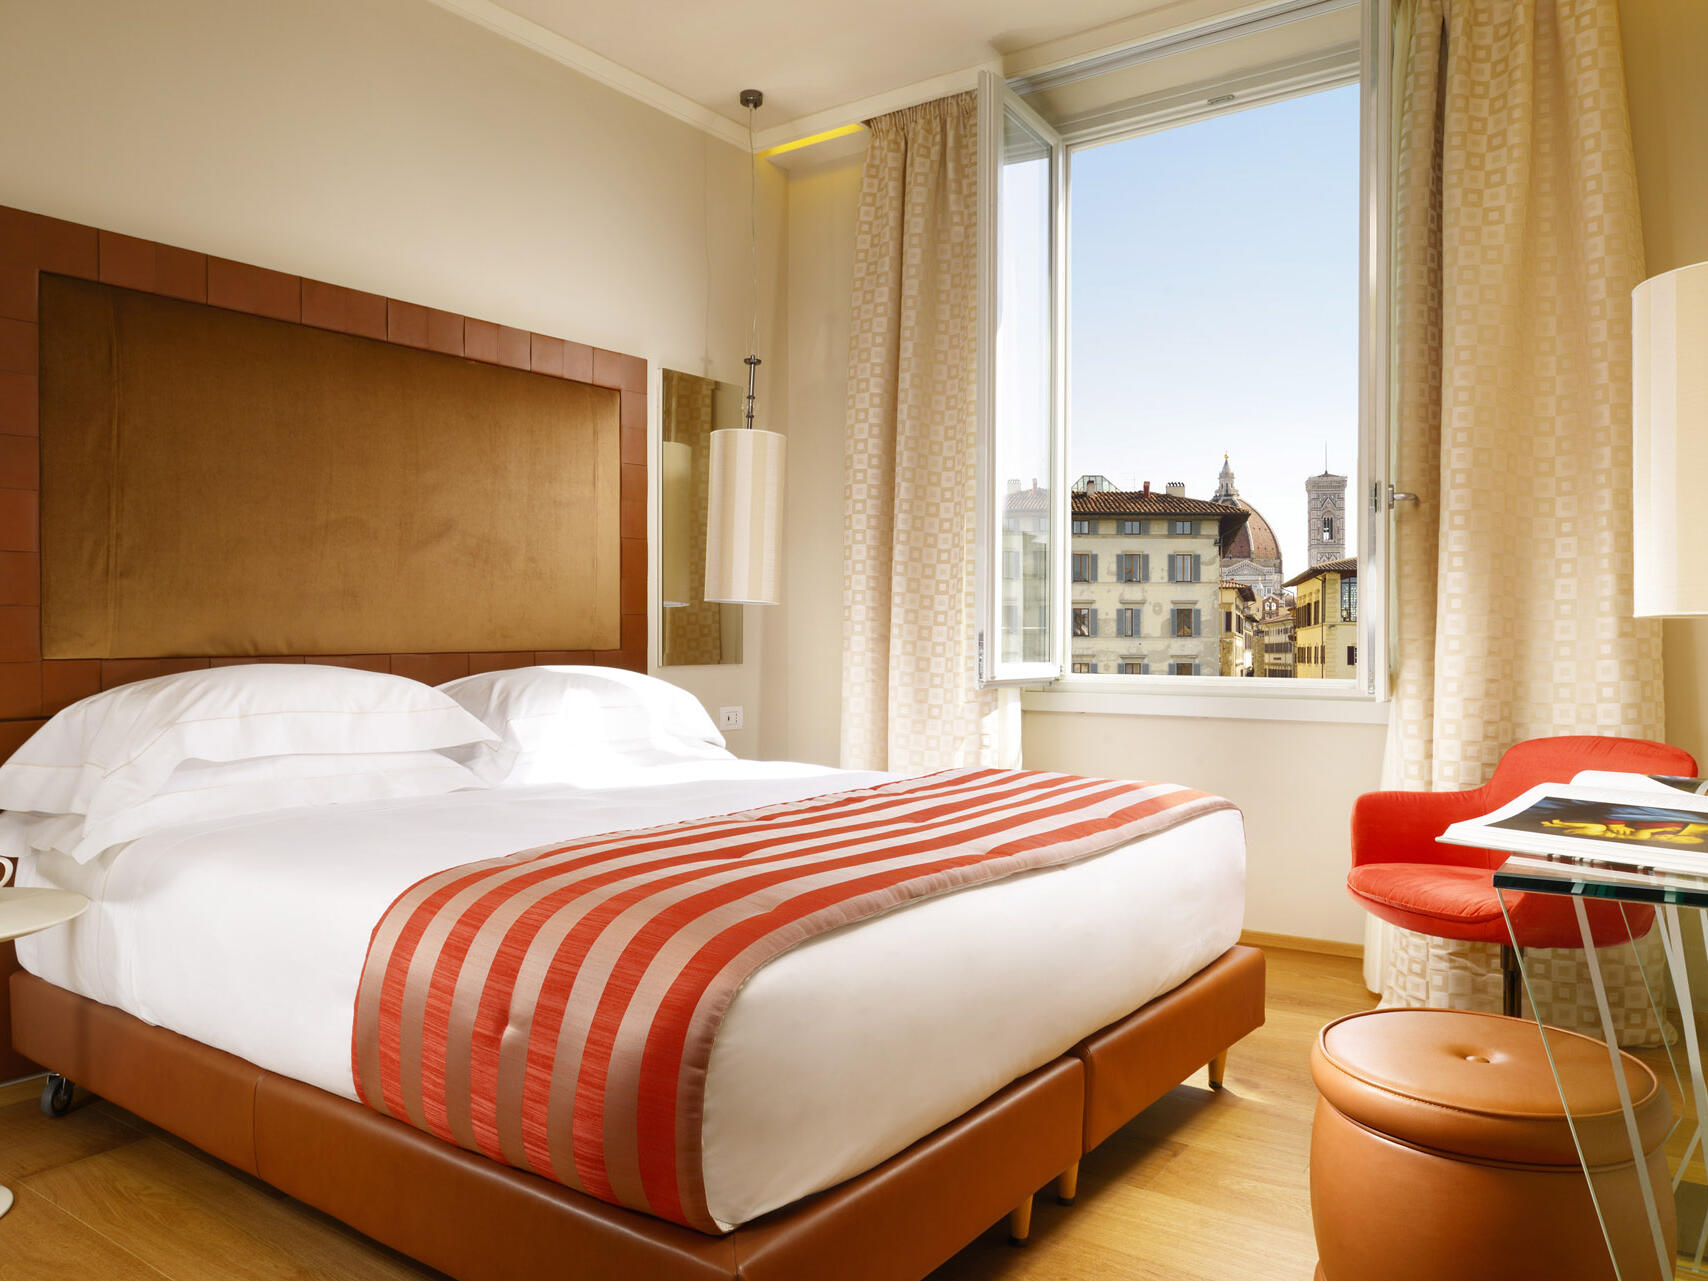 City view bedroom at Grand Hotel Minerva